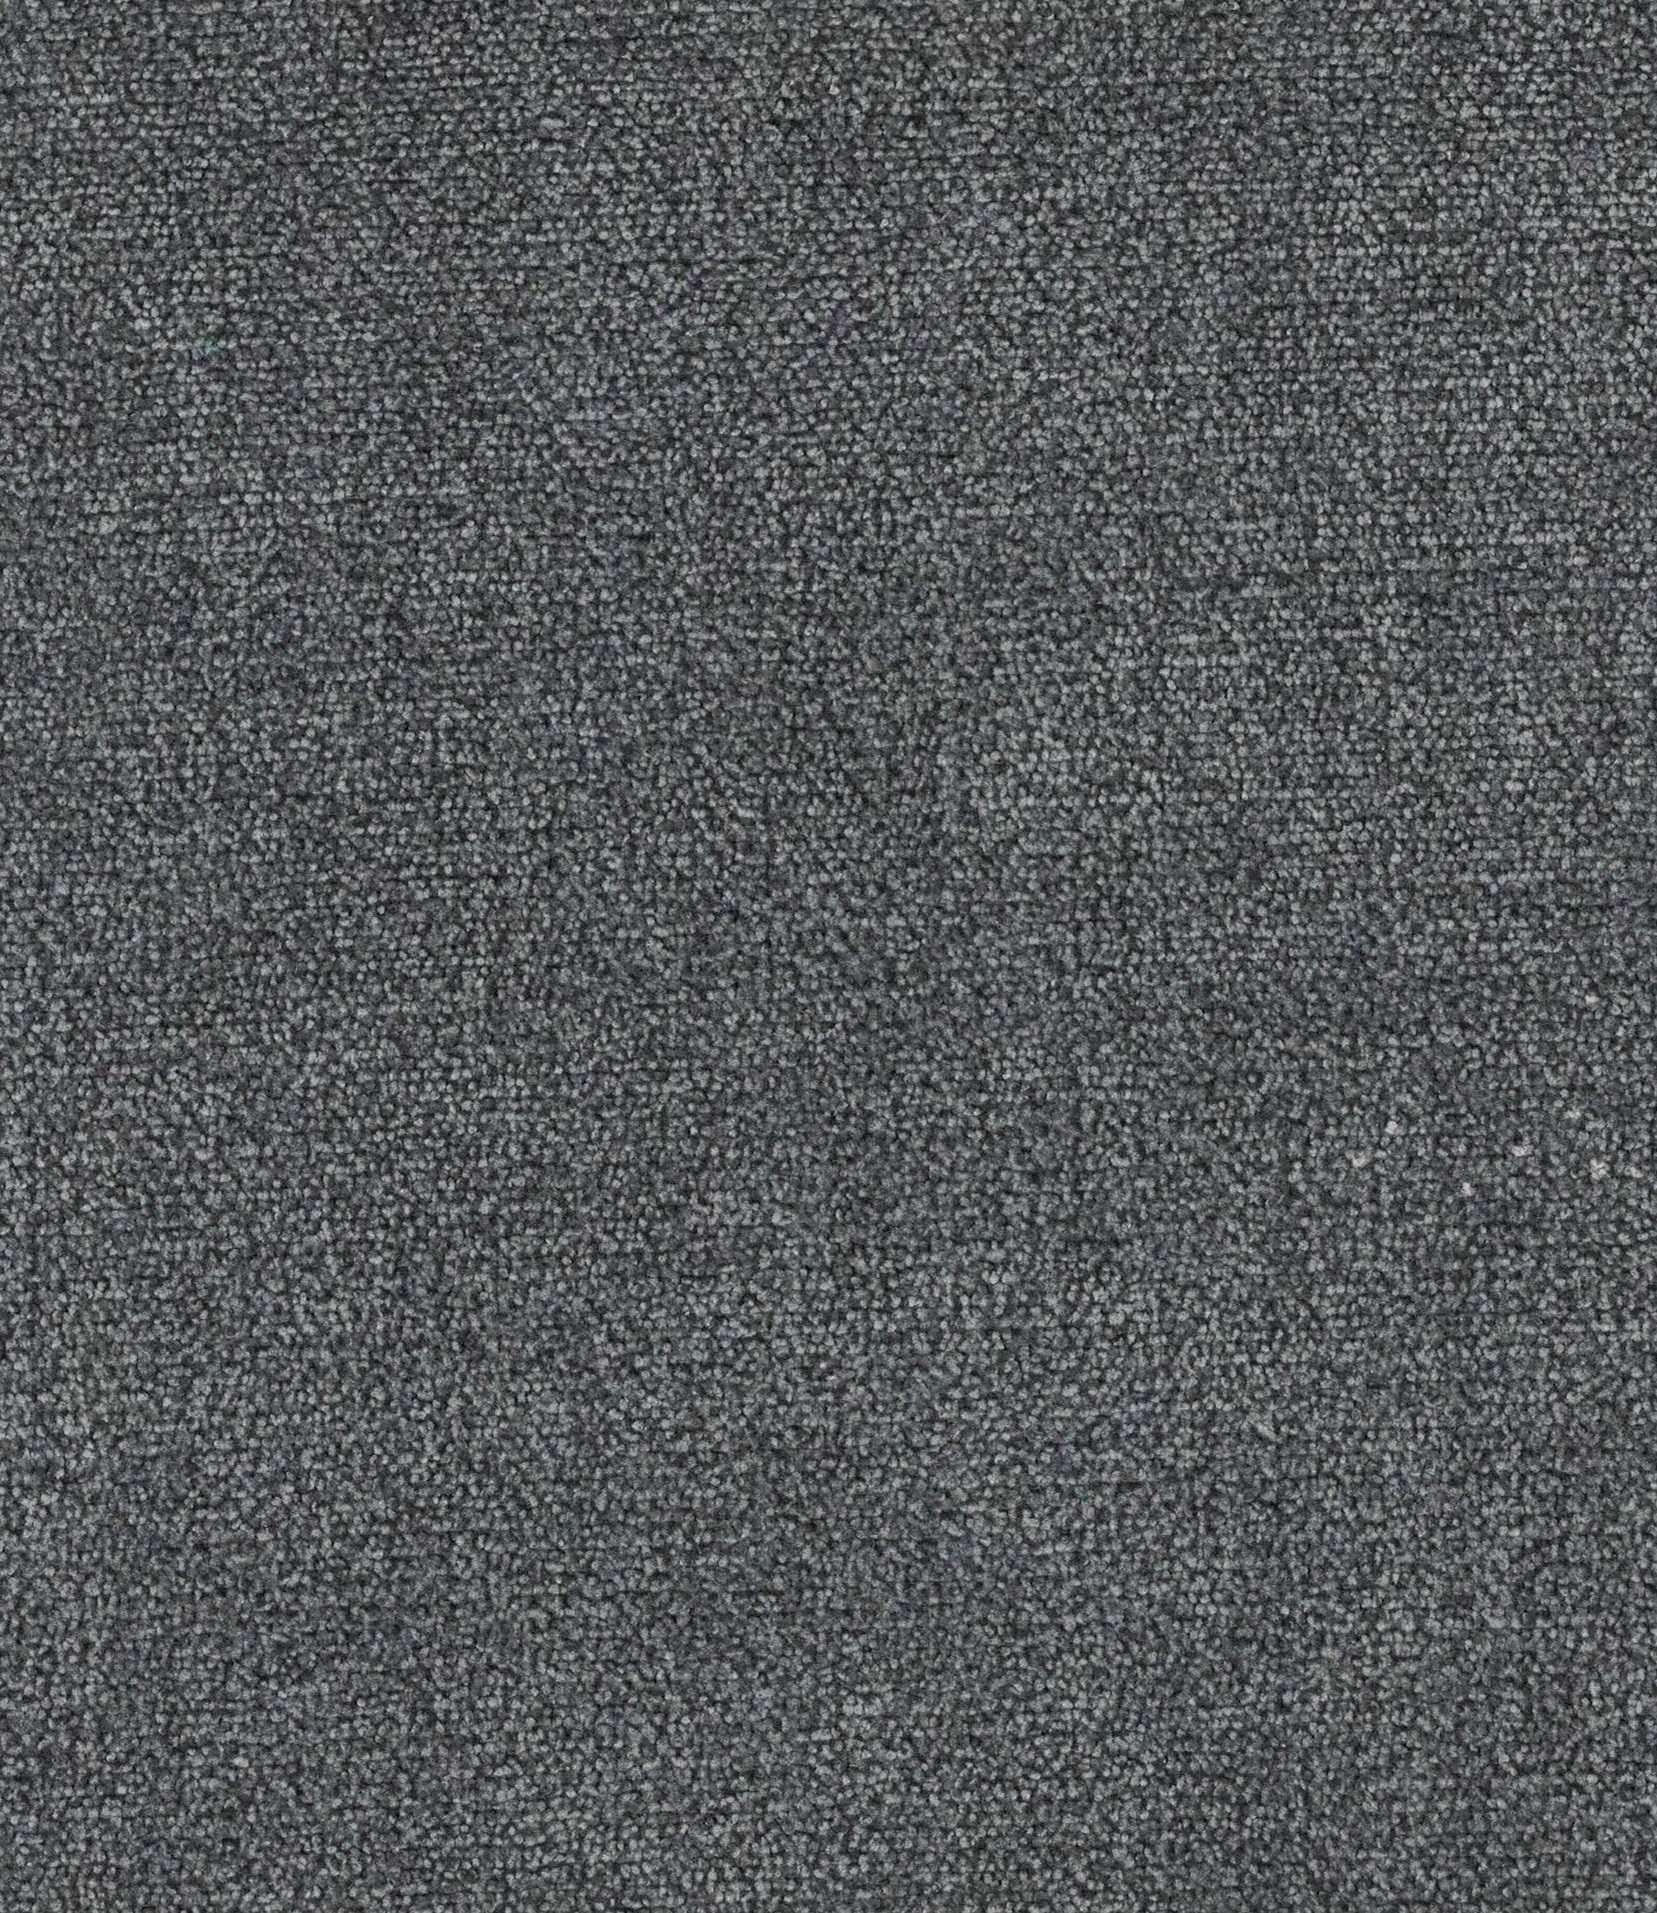 alfa 19 dark grey